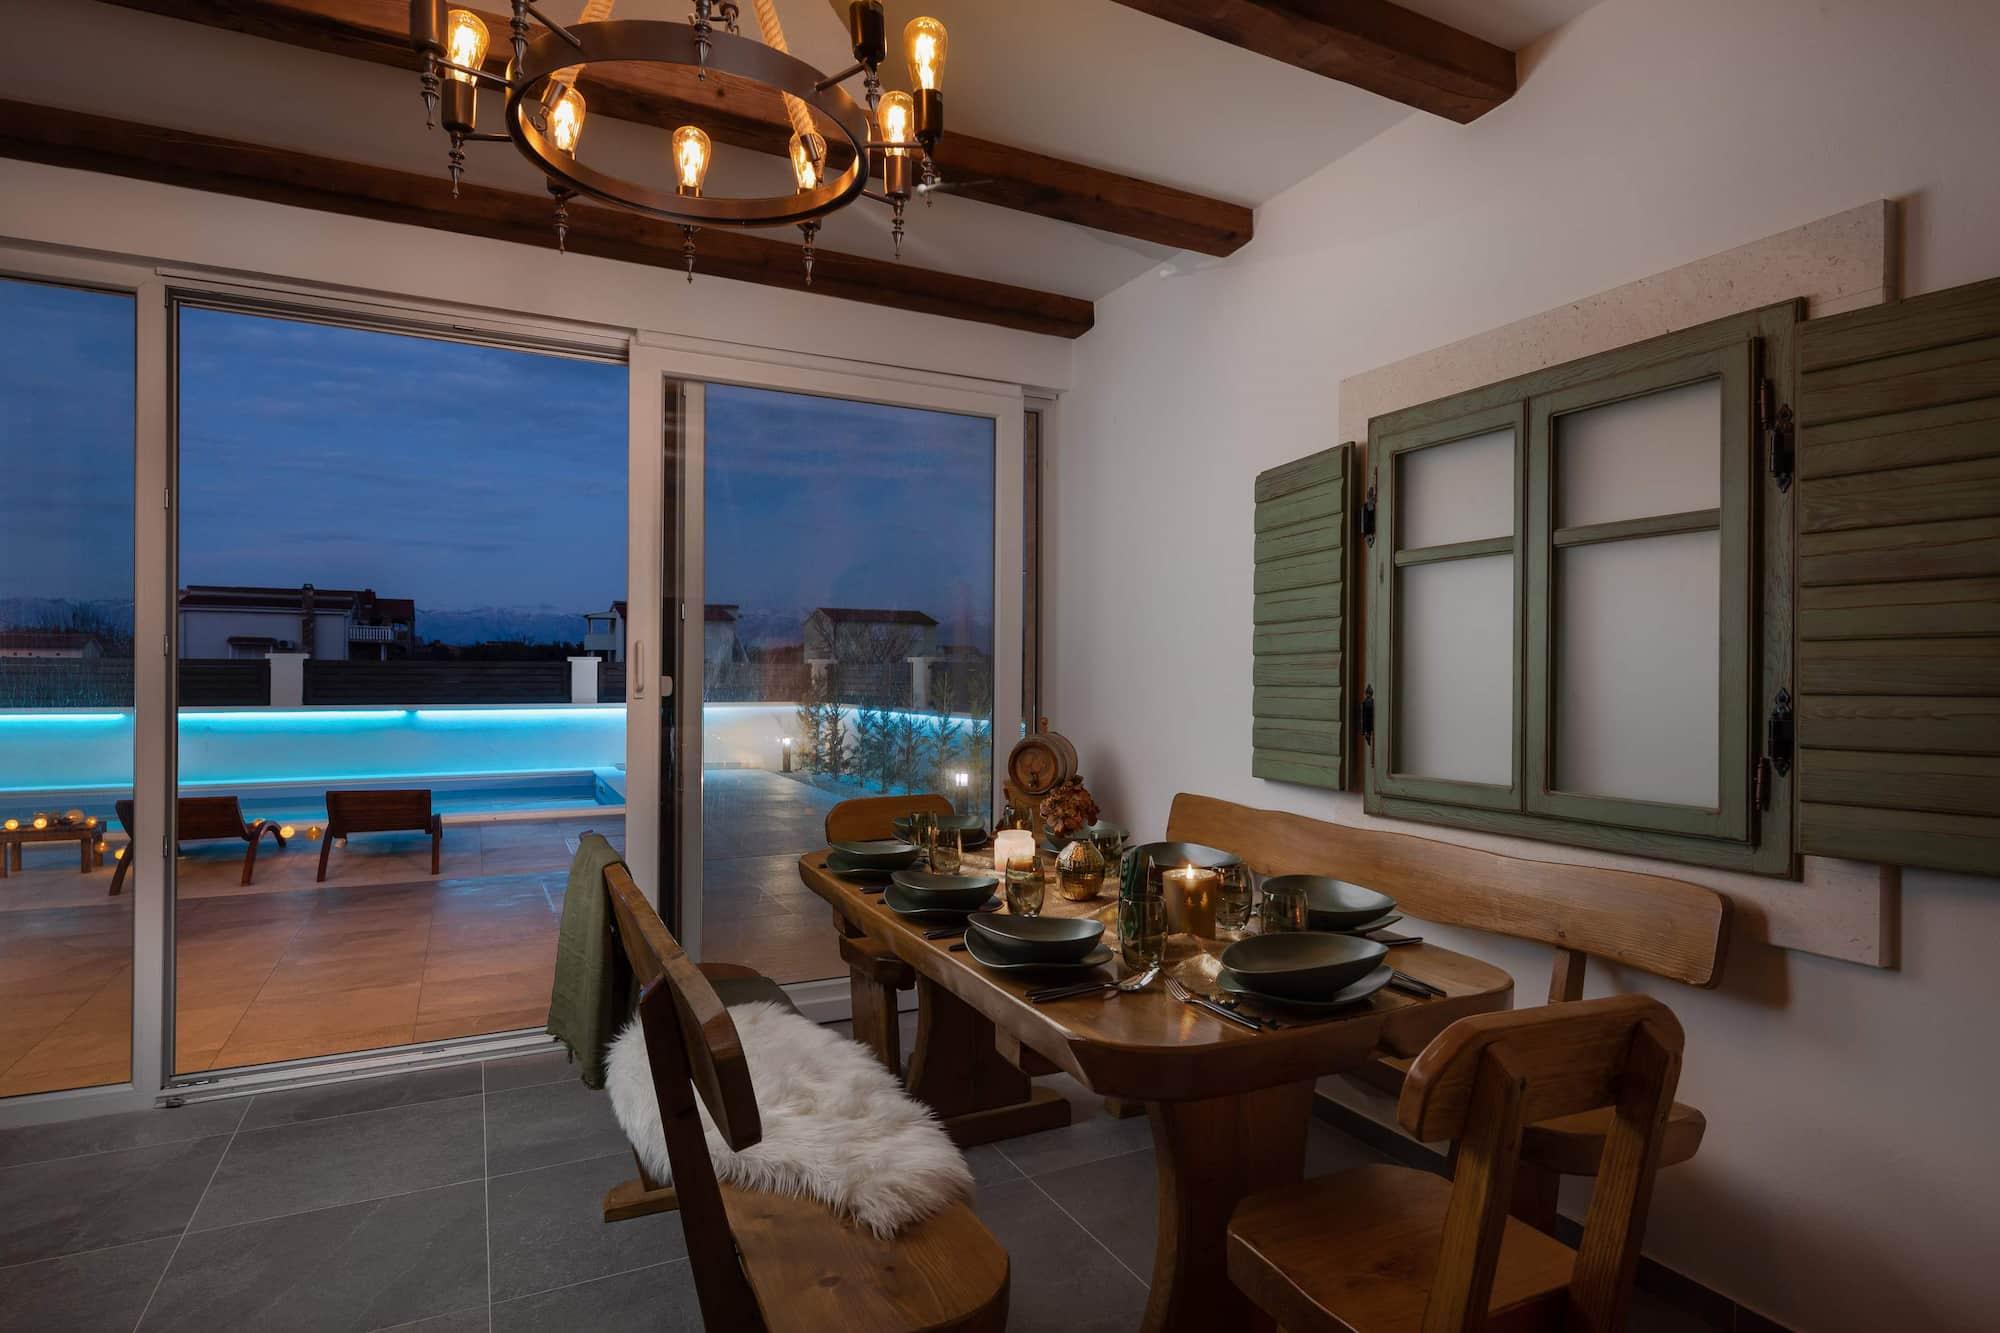 Vila za odmor s bazenom u Hrvatskoj, zatvorena terasa sa stolom za blagovanje i pogledom na bazen